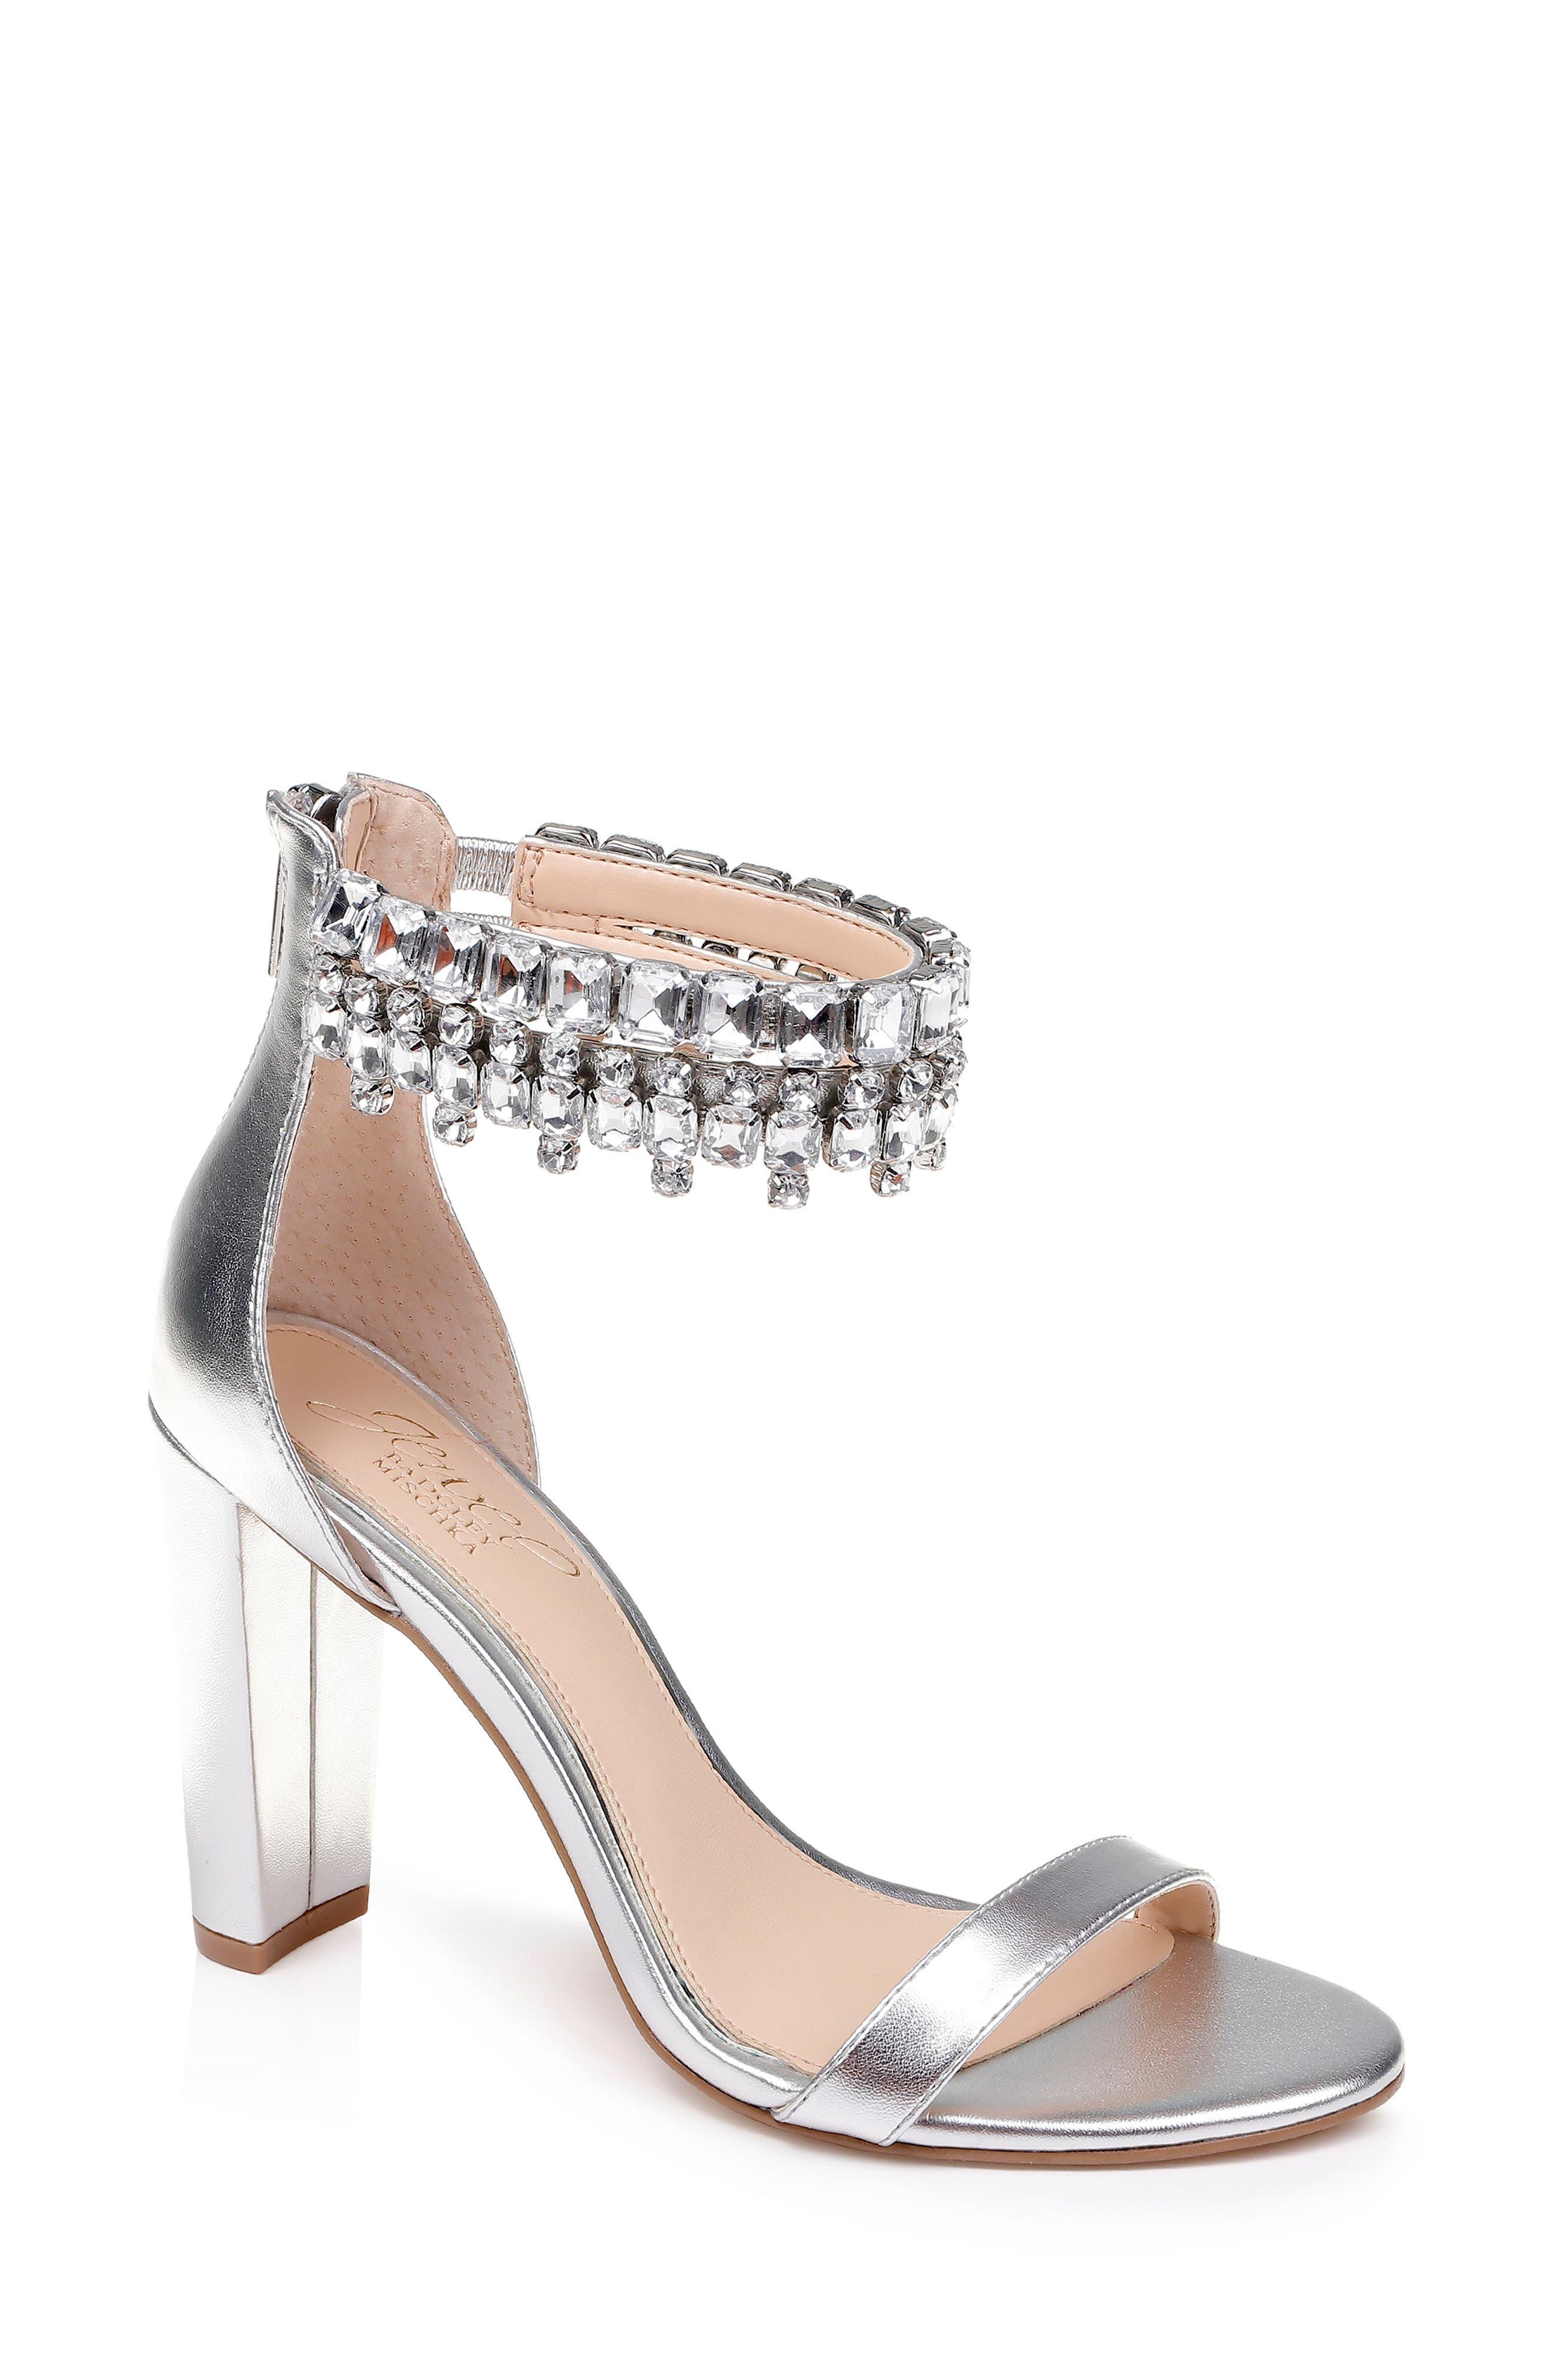 Jewel Badgley Mischka Dancer Ankle Strap Sandal, Metallic